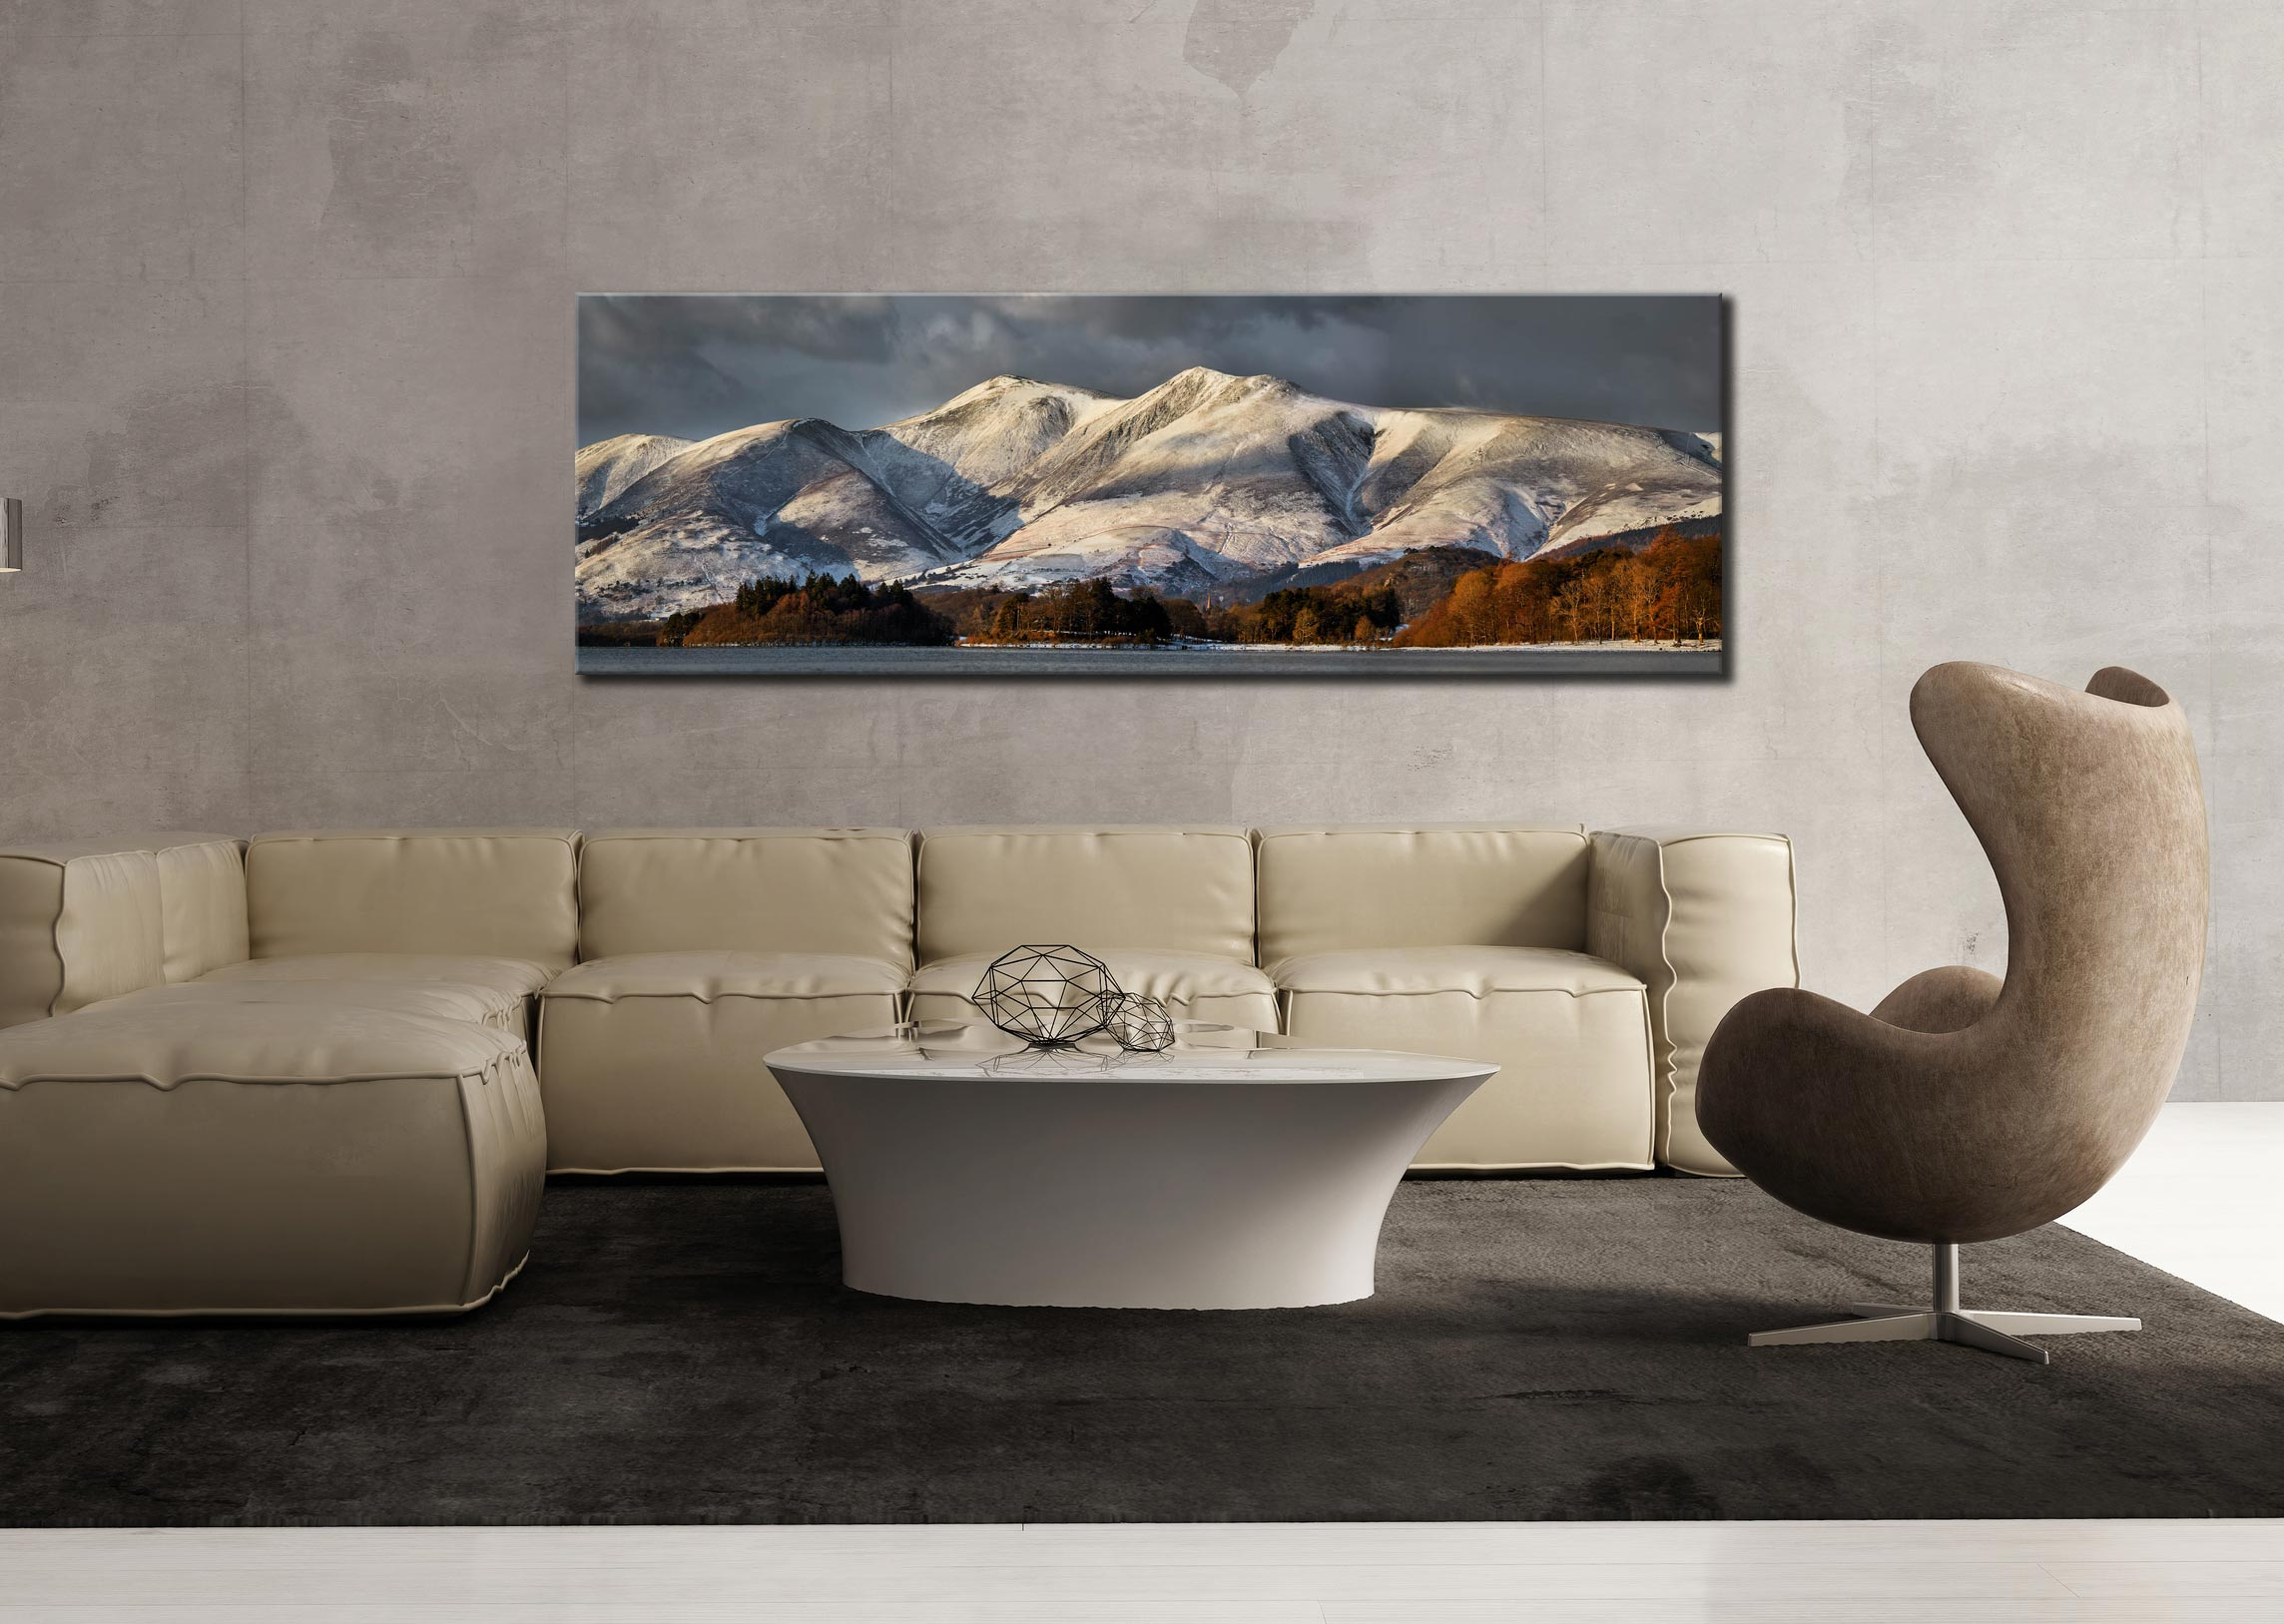 Skiddaw Winter Panorama - Print Aluminium Backing With Acrylic Glazing on Wall